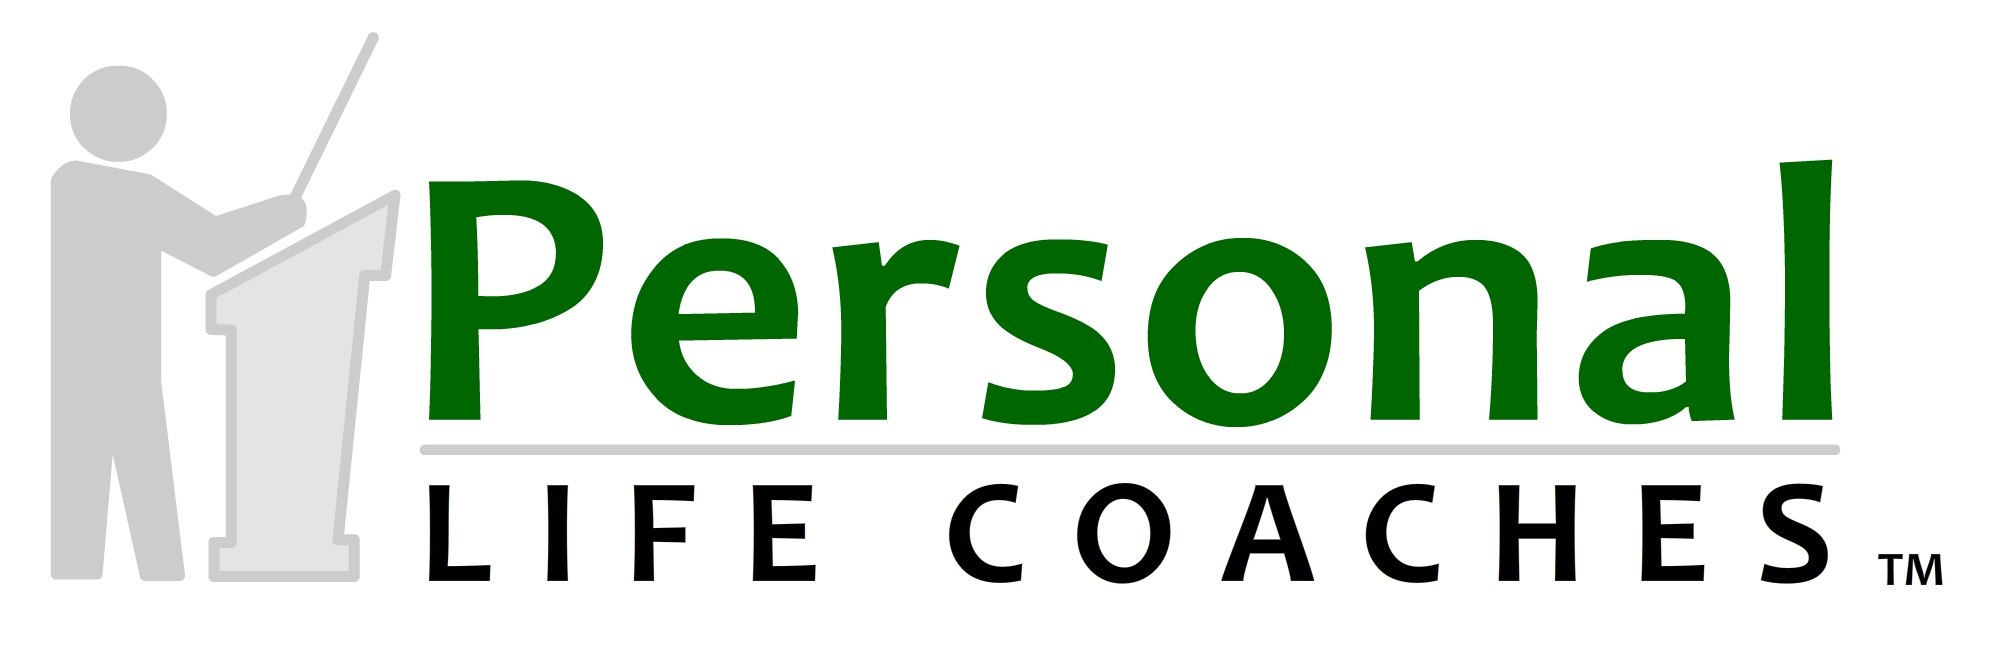 Personal Life Coaches Logo